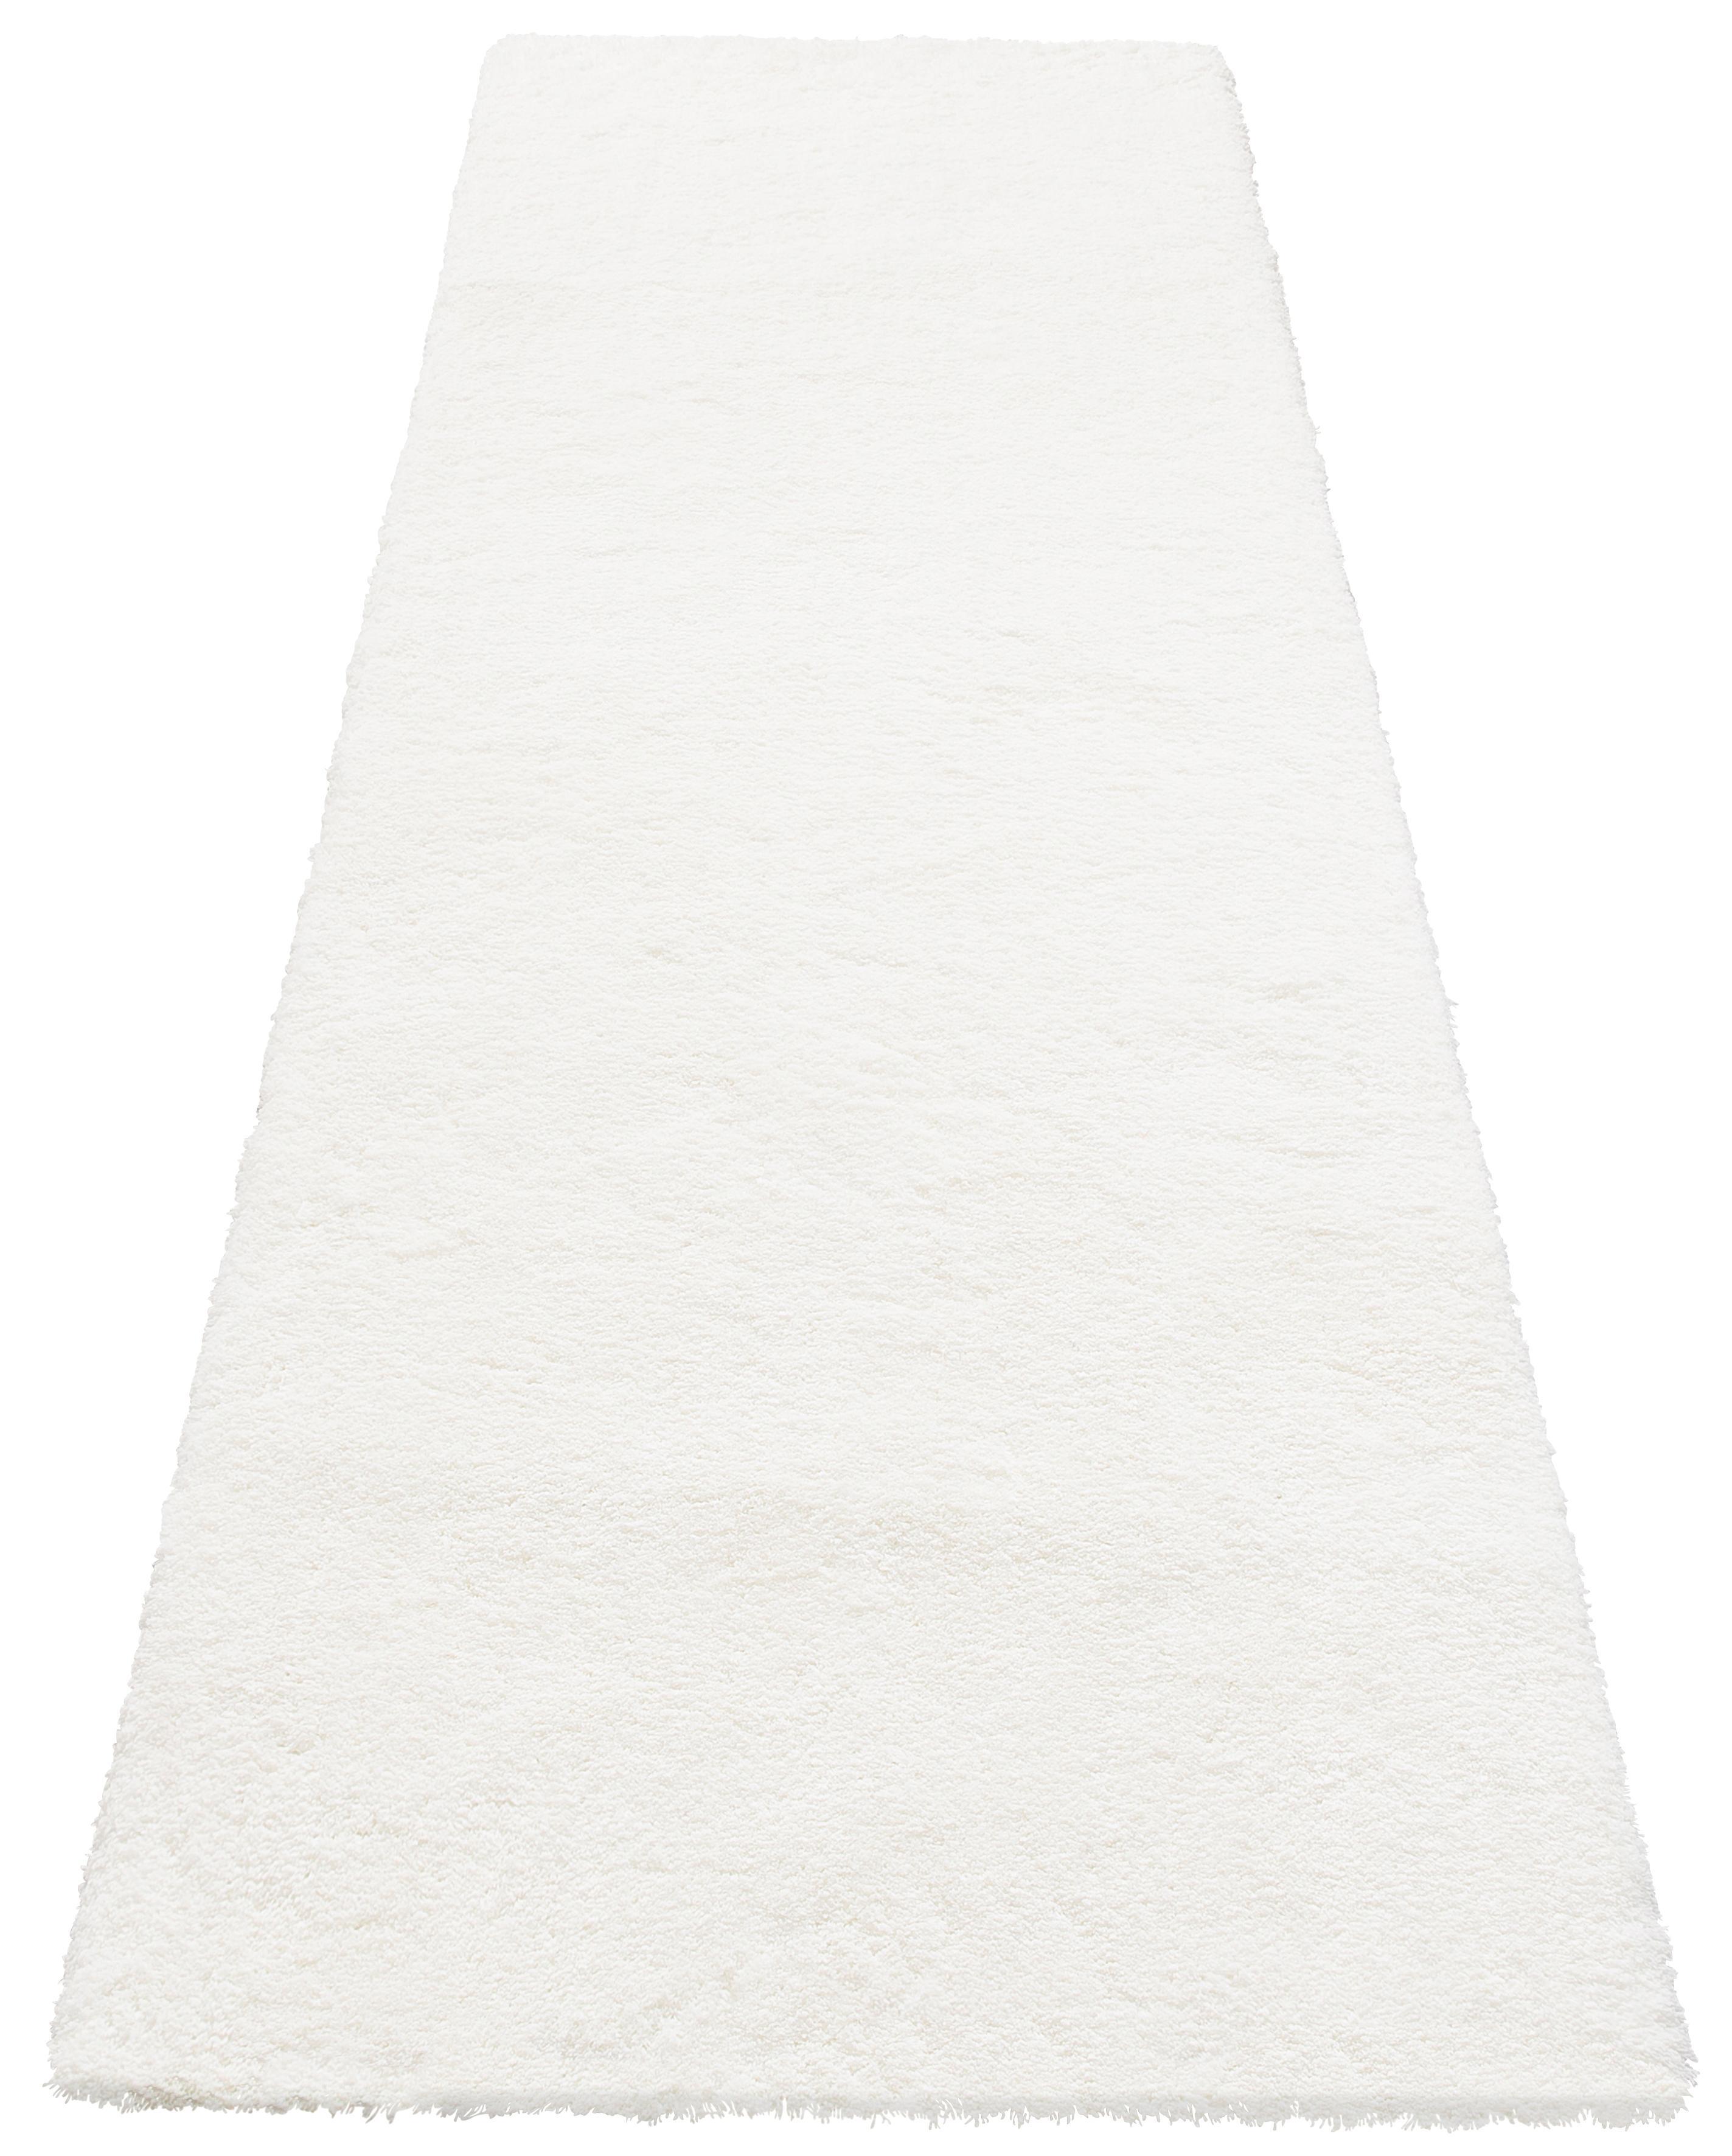 Hochflor-Läufer, »Magong«, my home Selection, rechteckig, Höhe 25 mm, handgetuftet